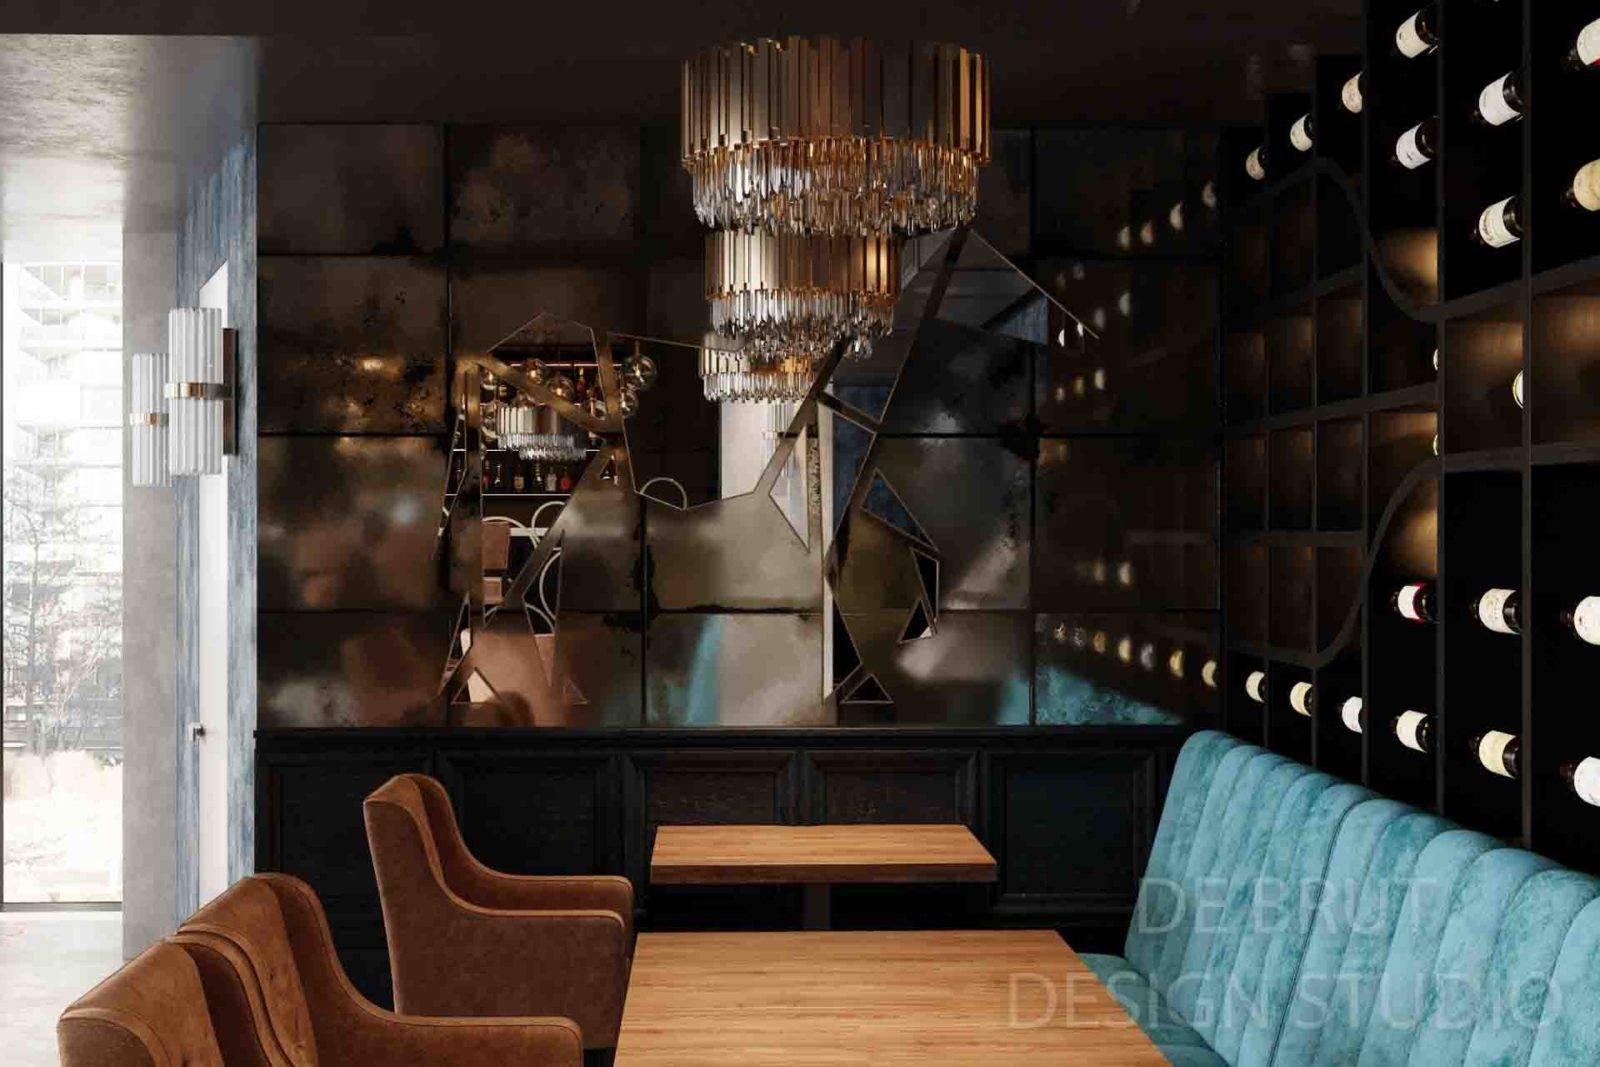 design interieru praha alex brut studio richman bussines bar 15 - Design interiéru restaurace Richman